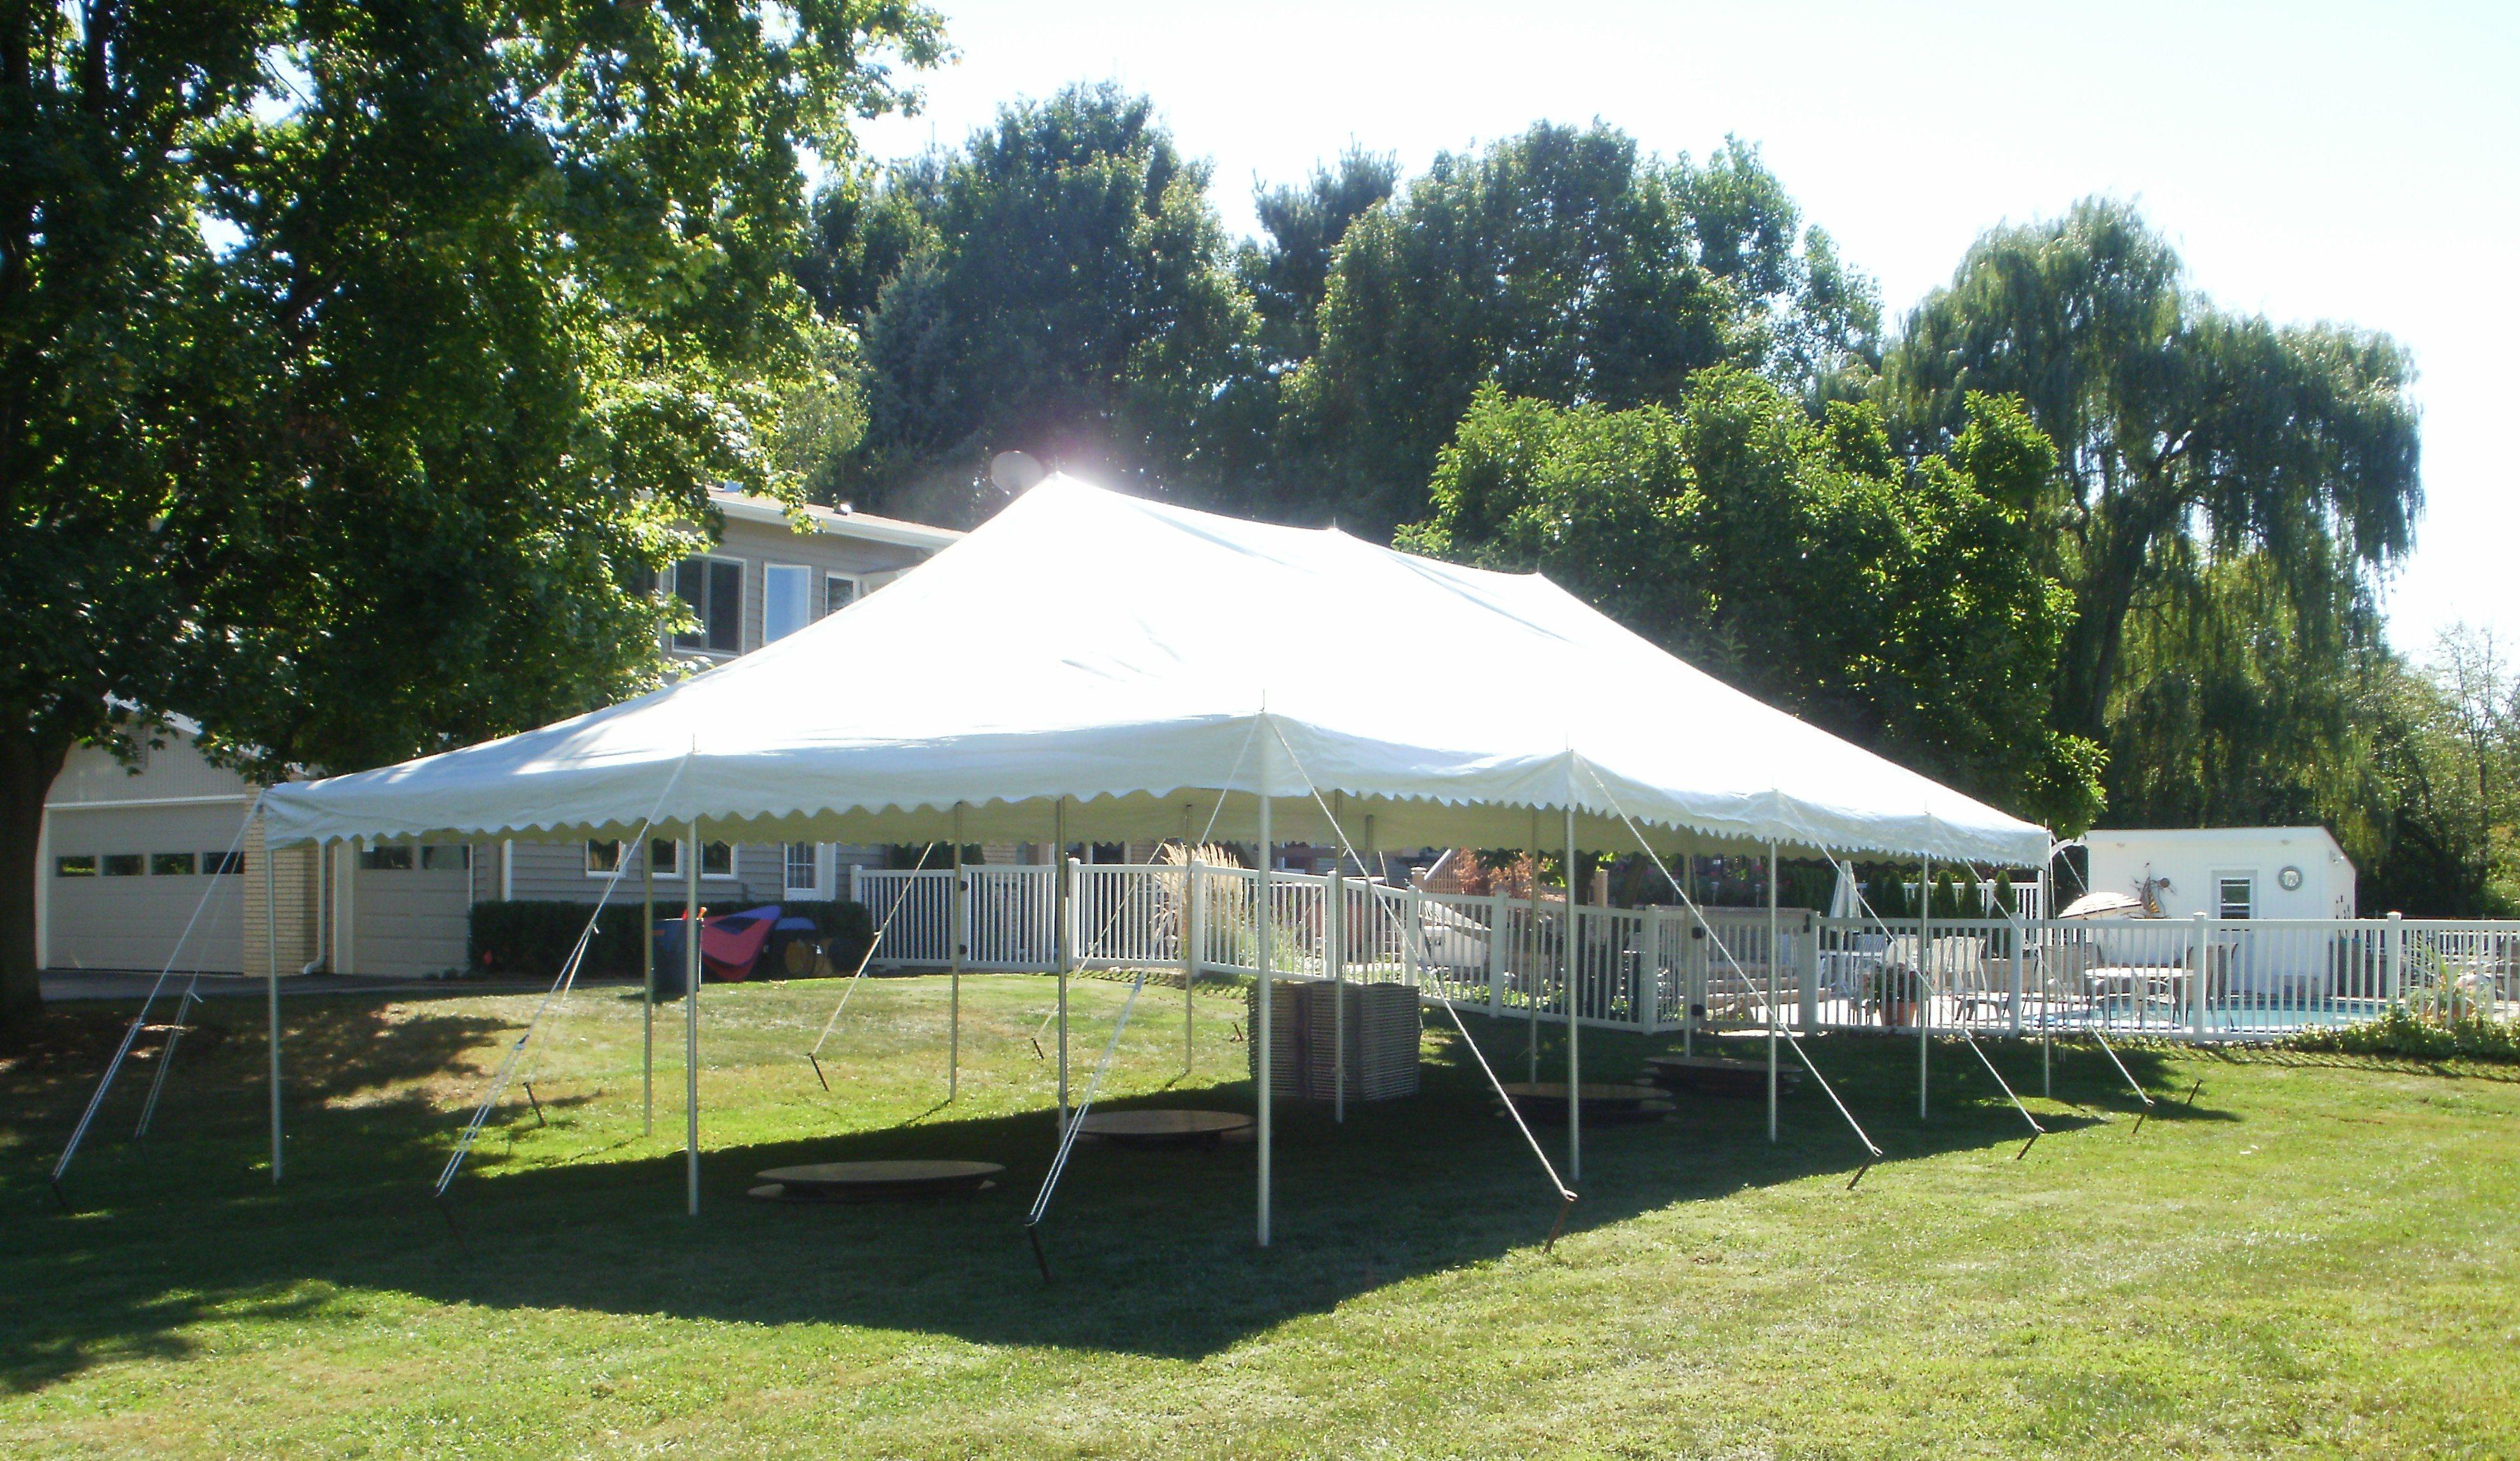 20 X 40 Canopy Pole Tent